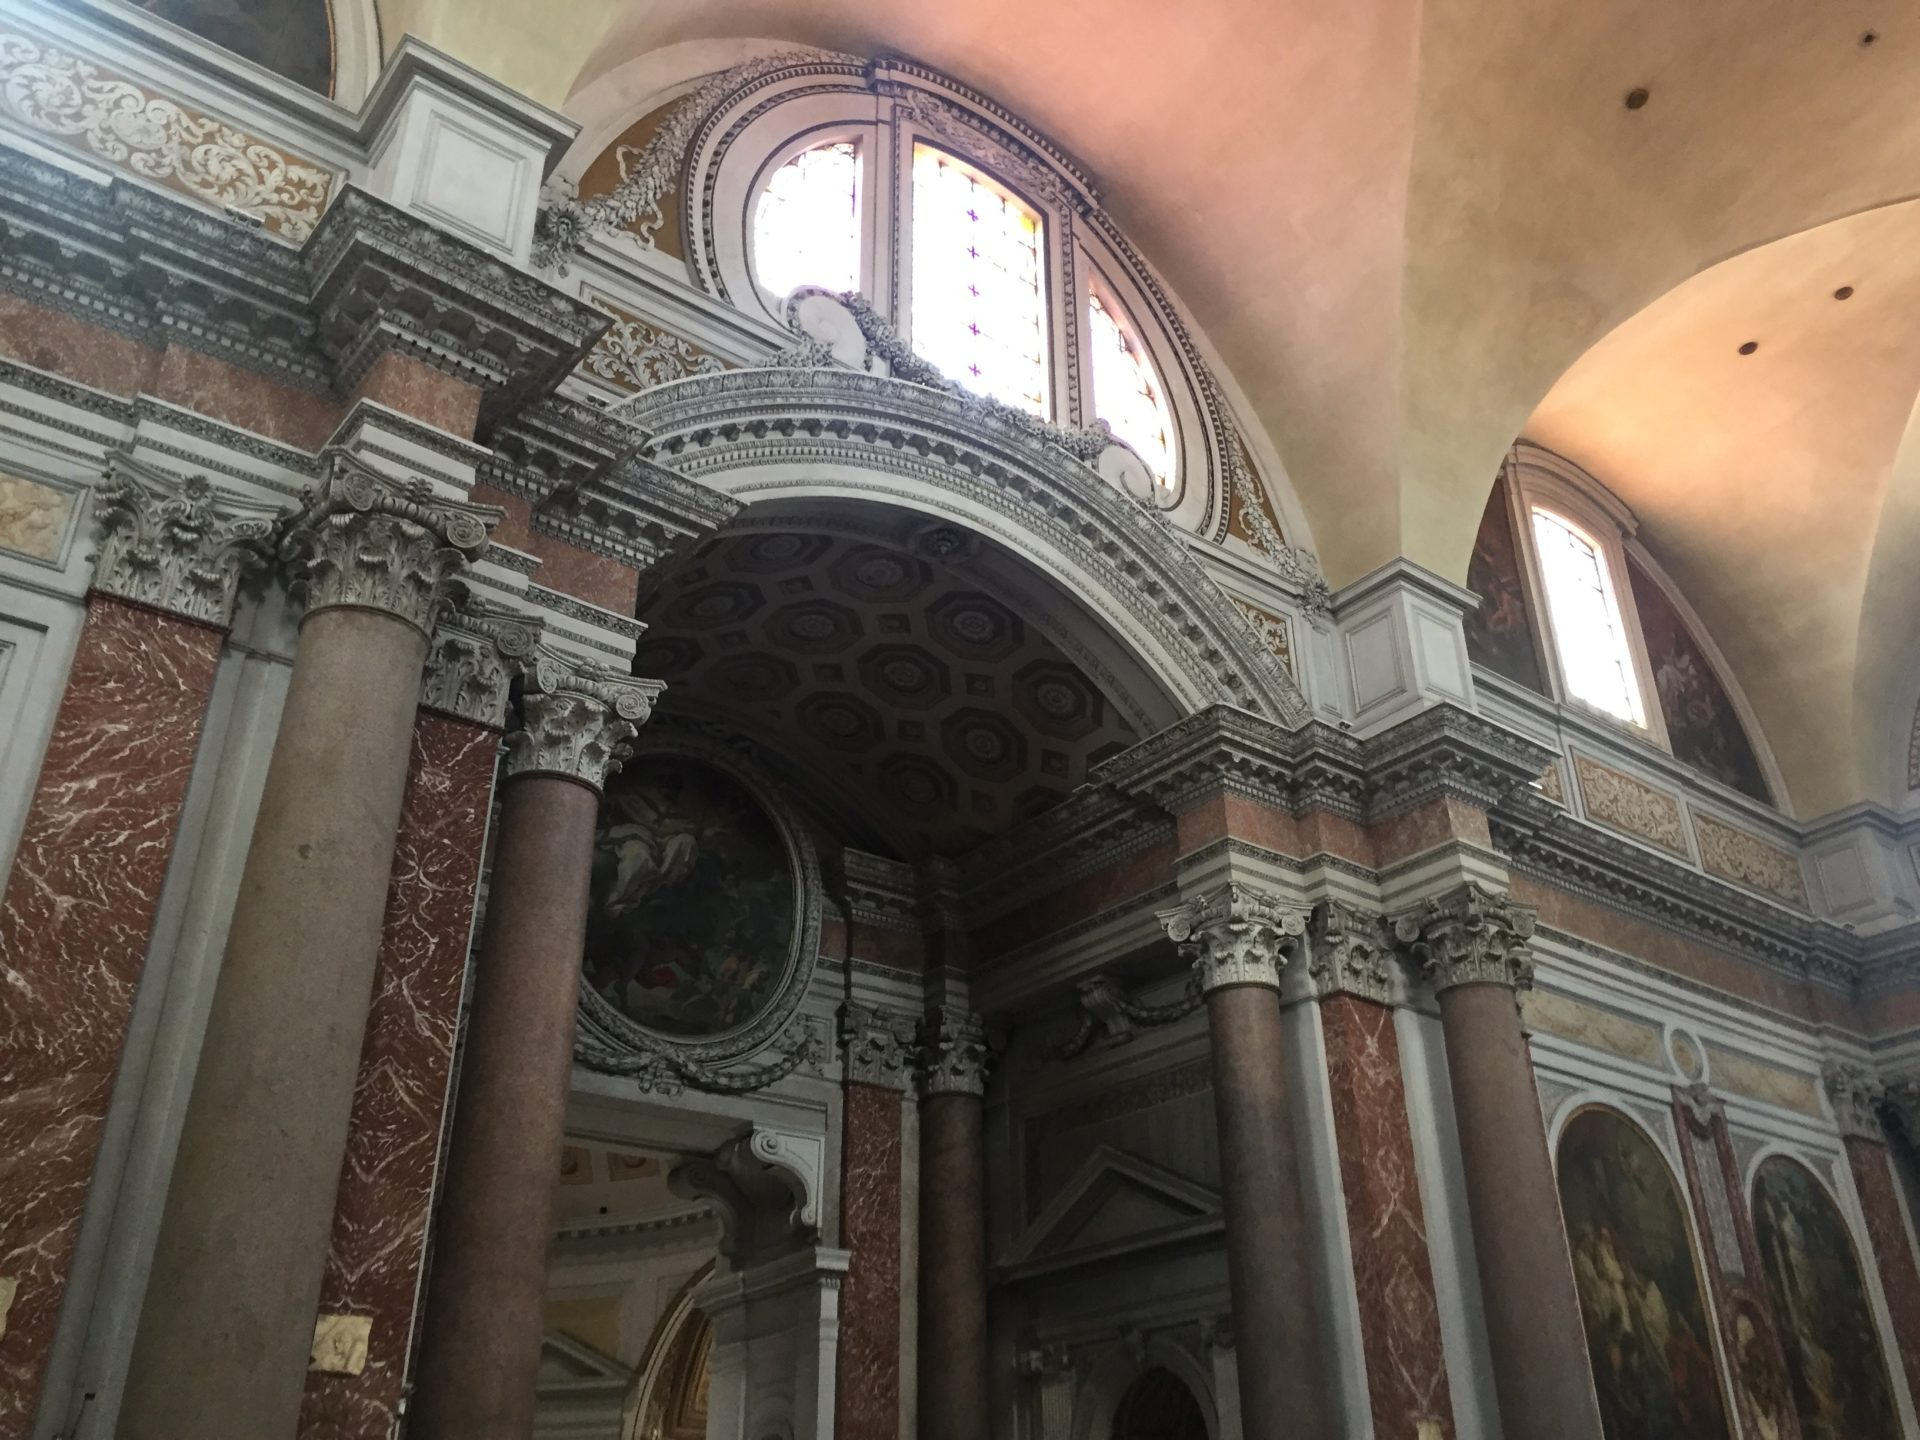 "<img src=""http://marenostrum.pl/wp-content/uploads//2019/11/Kościół-Santa-Maria-degli-Angeli-3.jpeg"" alt=""kolumny granitowe kościół santa Maria degli Angeli et dei Martiri Rzym"" />"